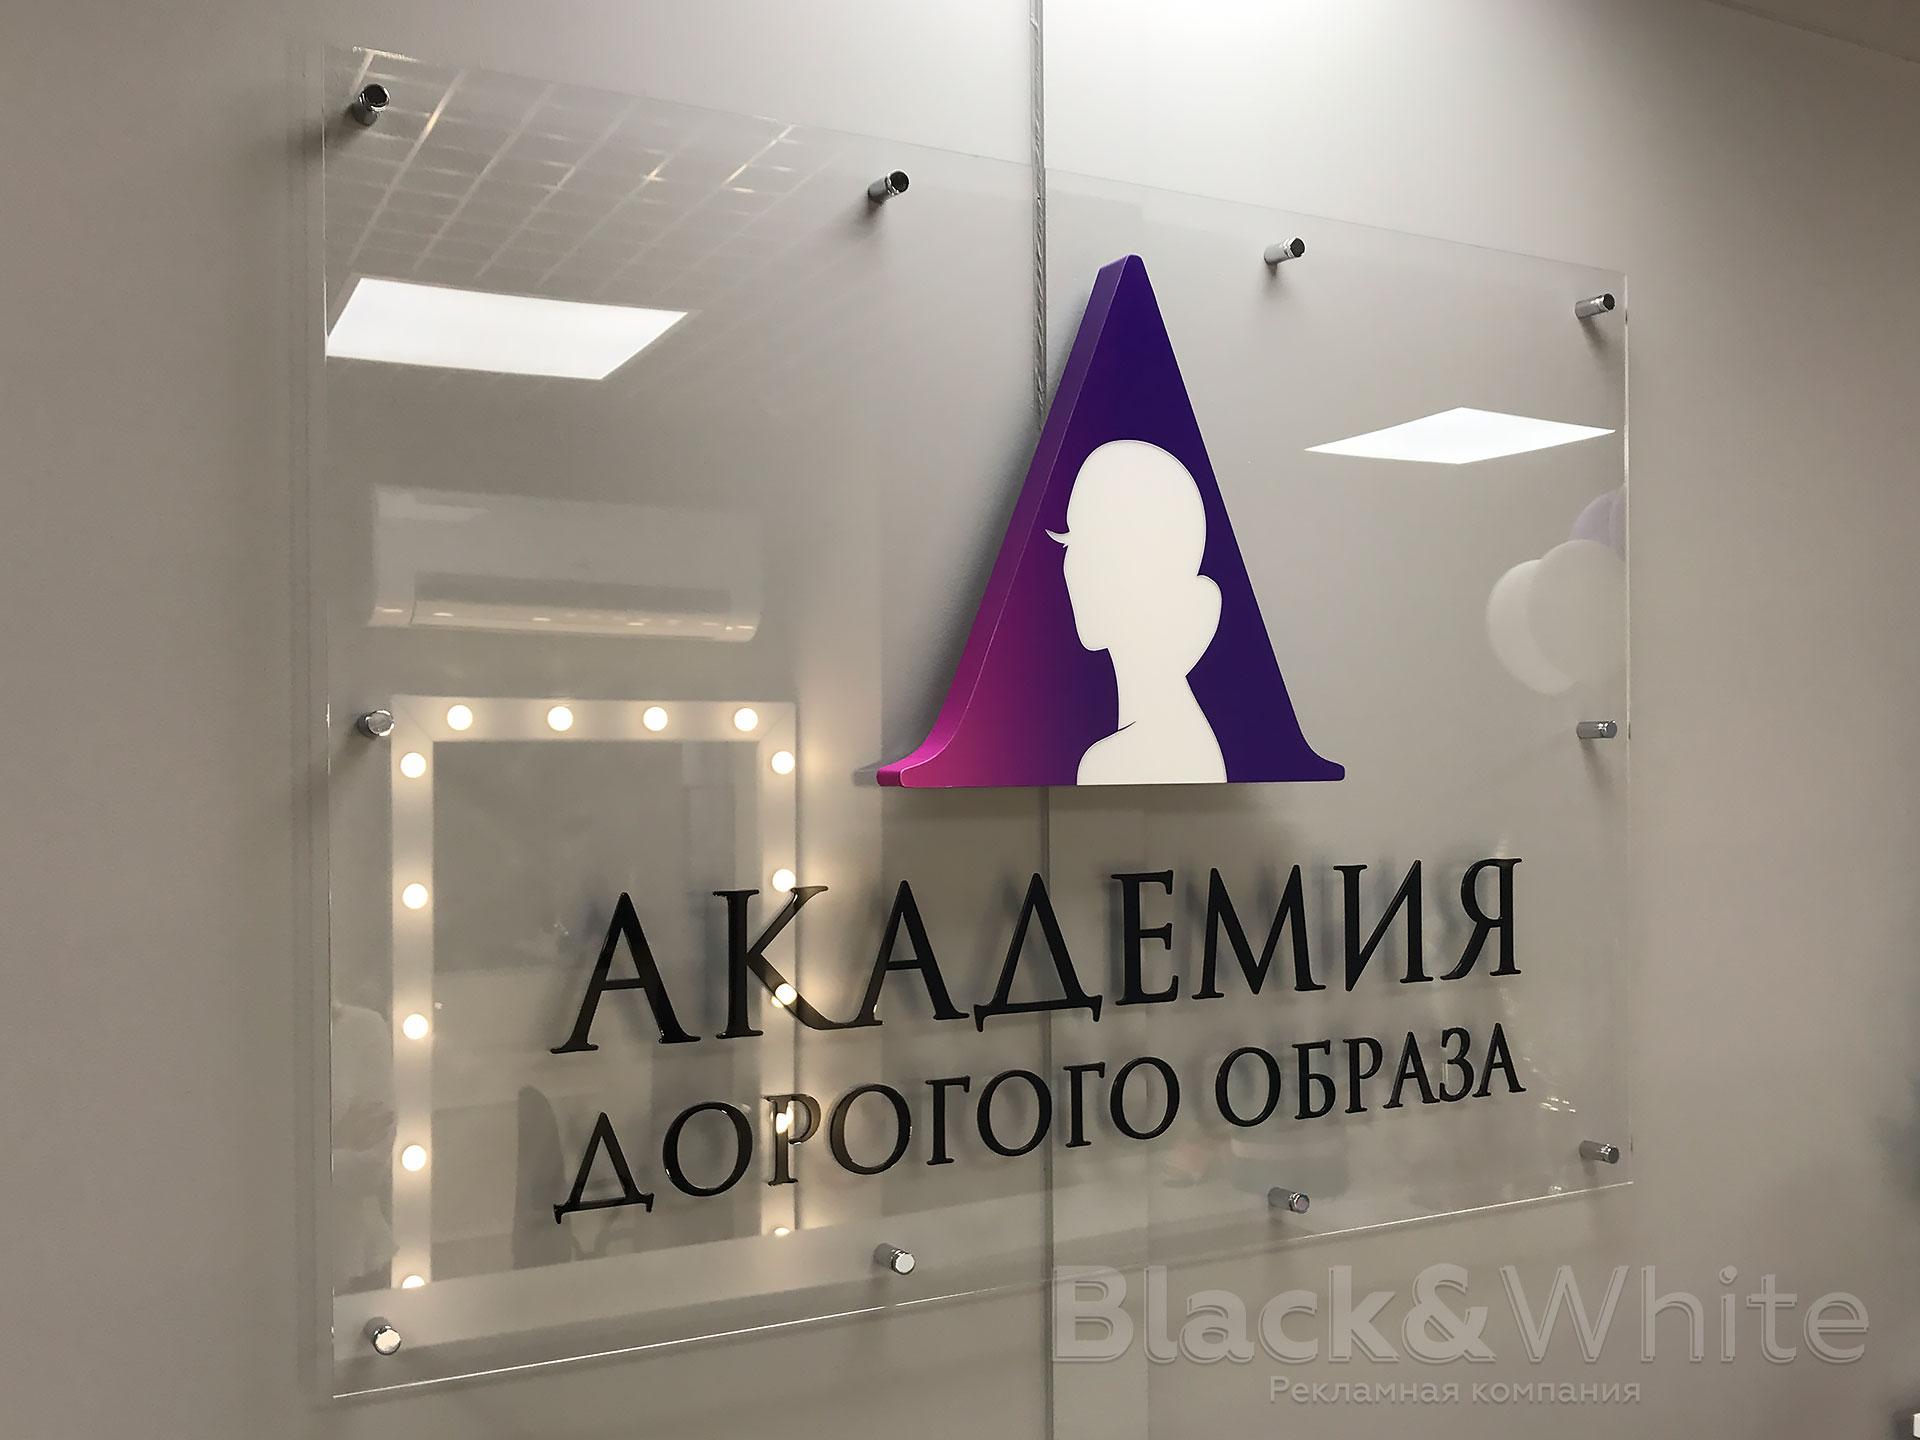 Таблички-из-акрила-красноярск-Black&White-BW.jpg